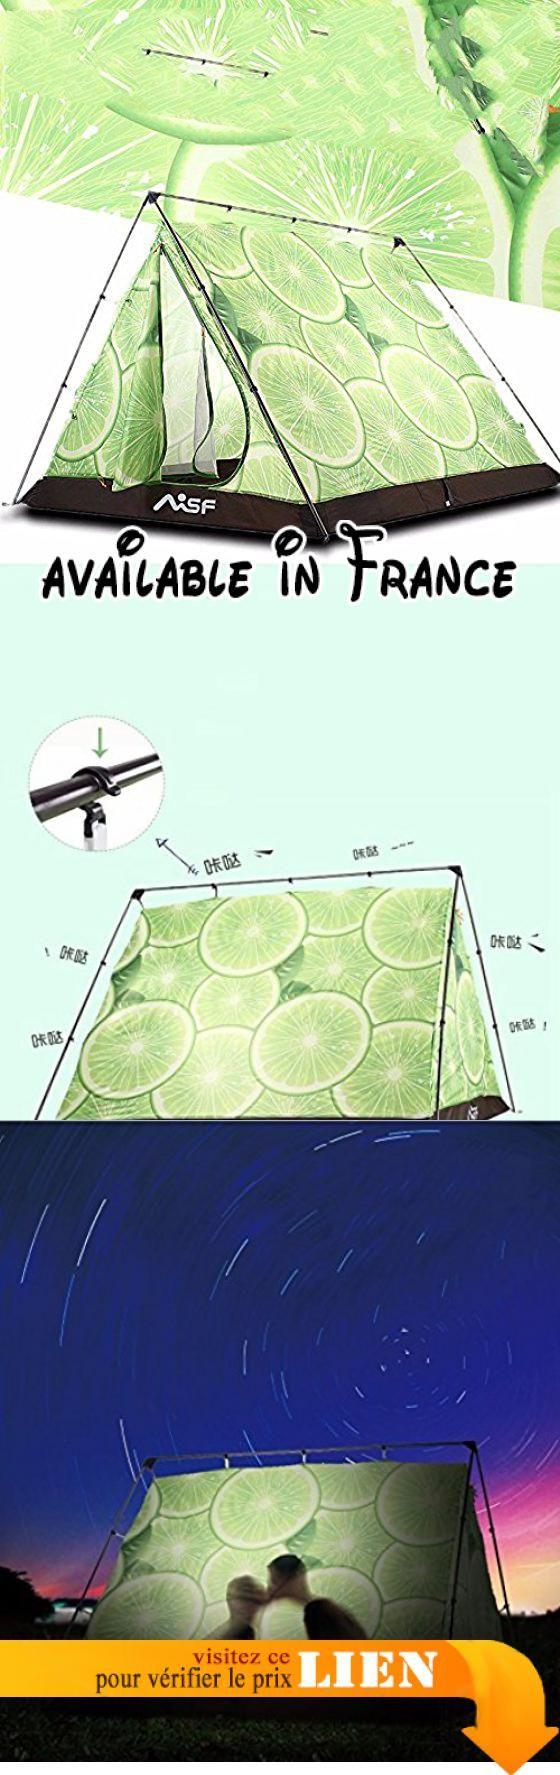 B075867VB6   zhudj Grand espace Tente Outdoor Camping amoureux plage  personnalité triangle double citron. Dimensions de la tente  2grandes  chambres… c7dd71dd6ebd